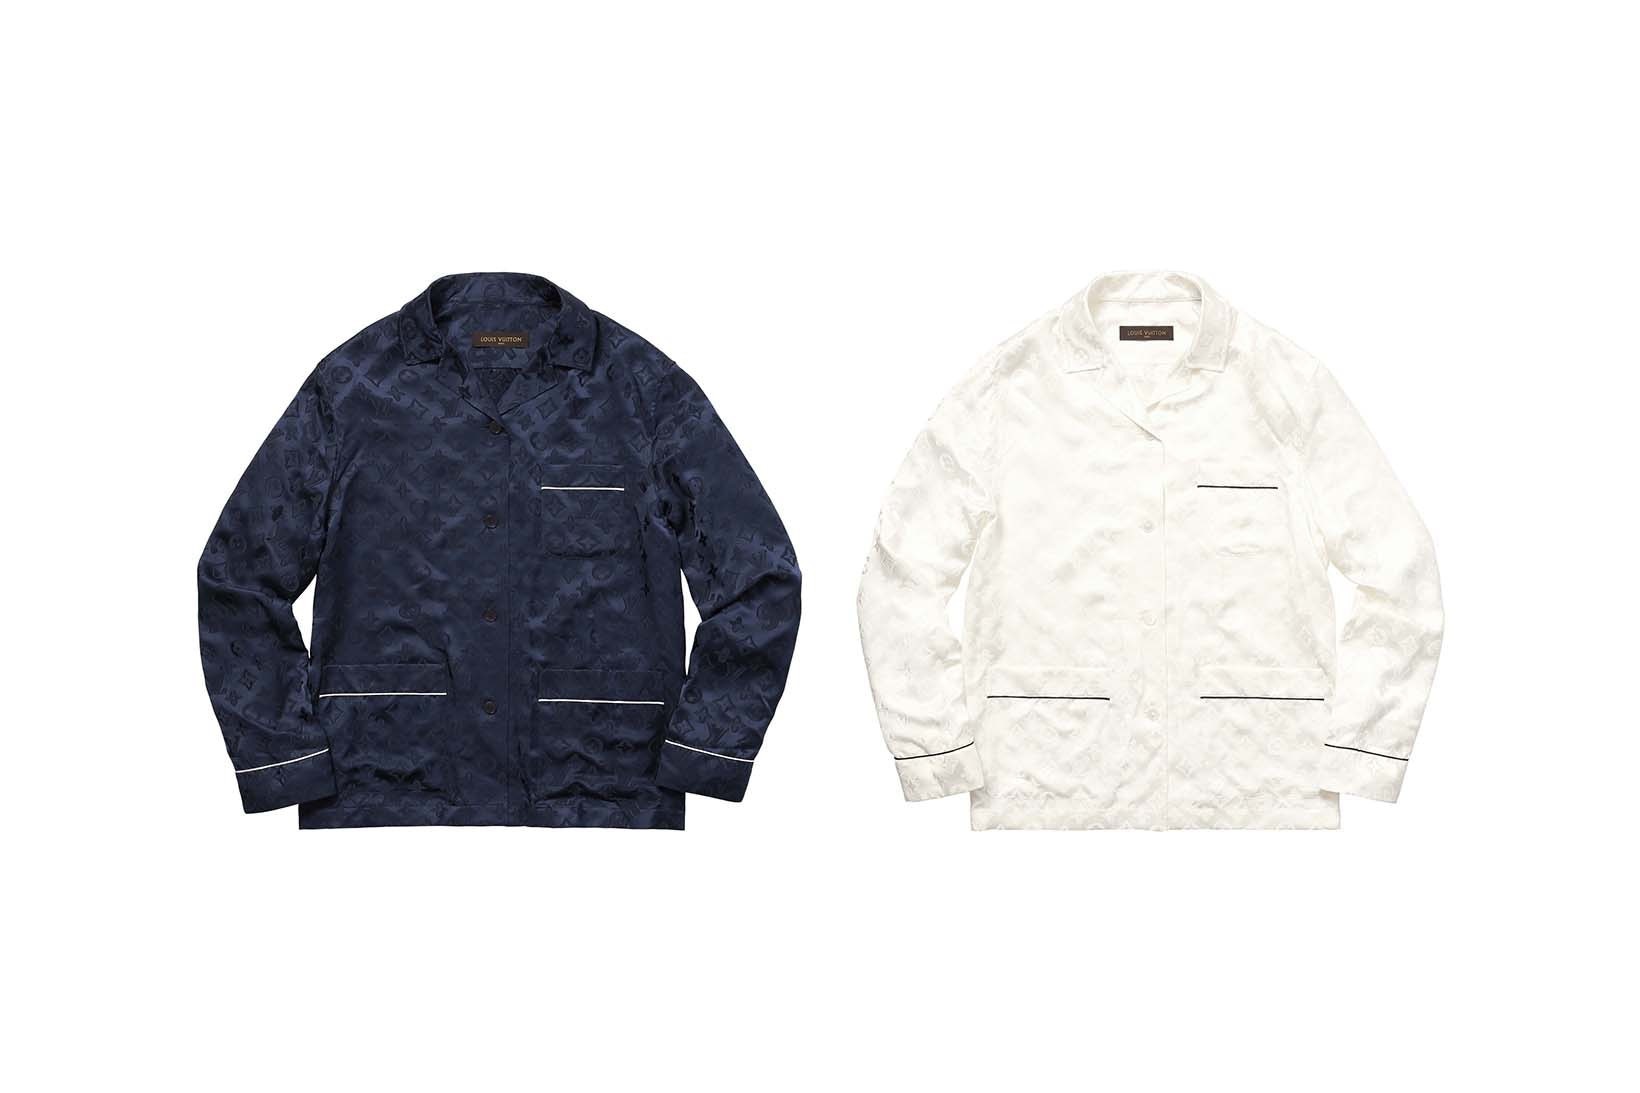 Supreme(シュプリーム)×Louis Vuitton(ルイ・ヴィトン) / ジャカード シルク パジャマ シャツ(Jacquard Silk Pajama Shirt)